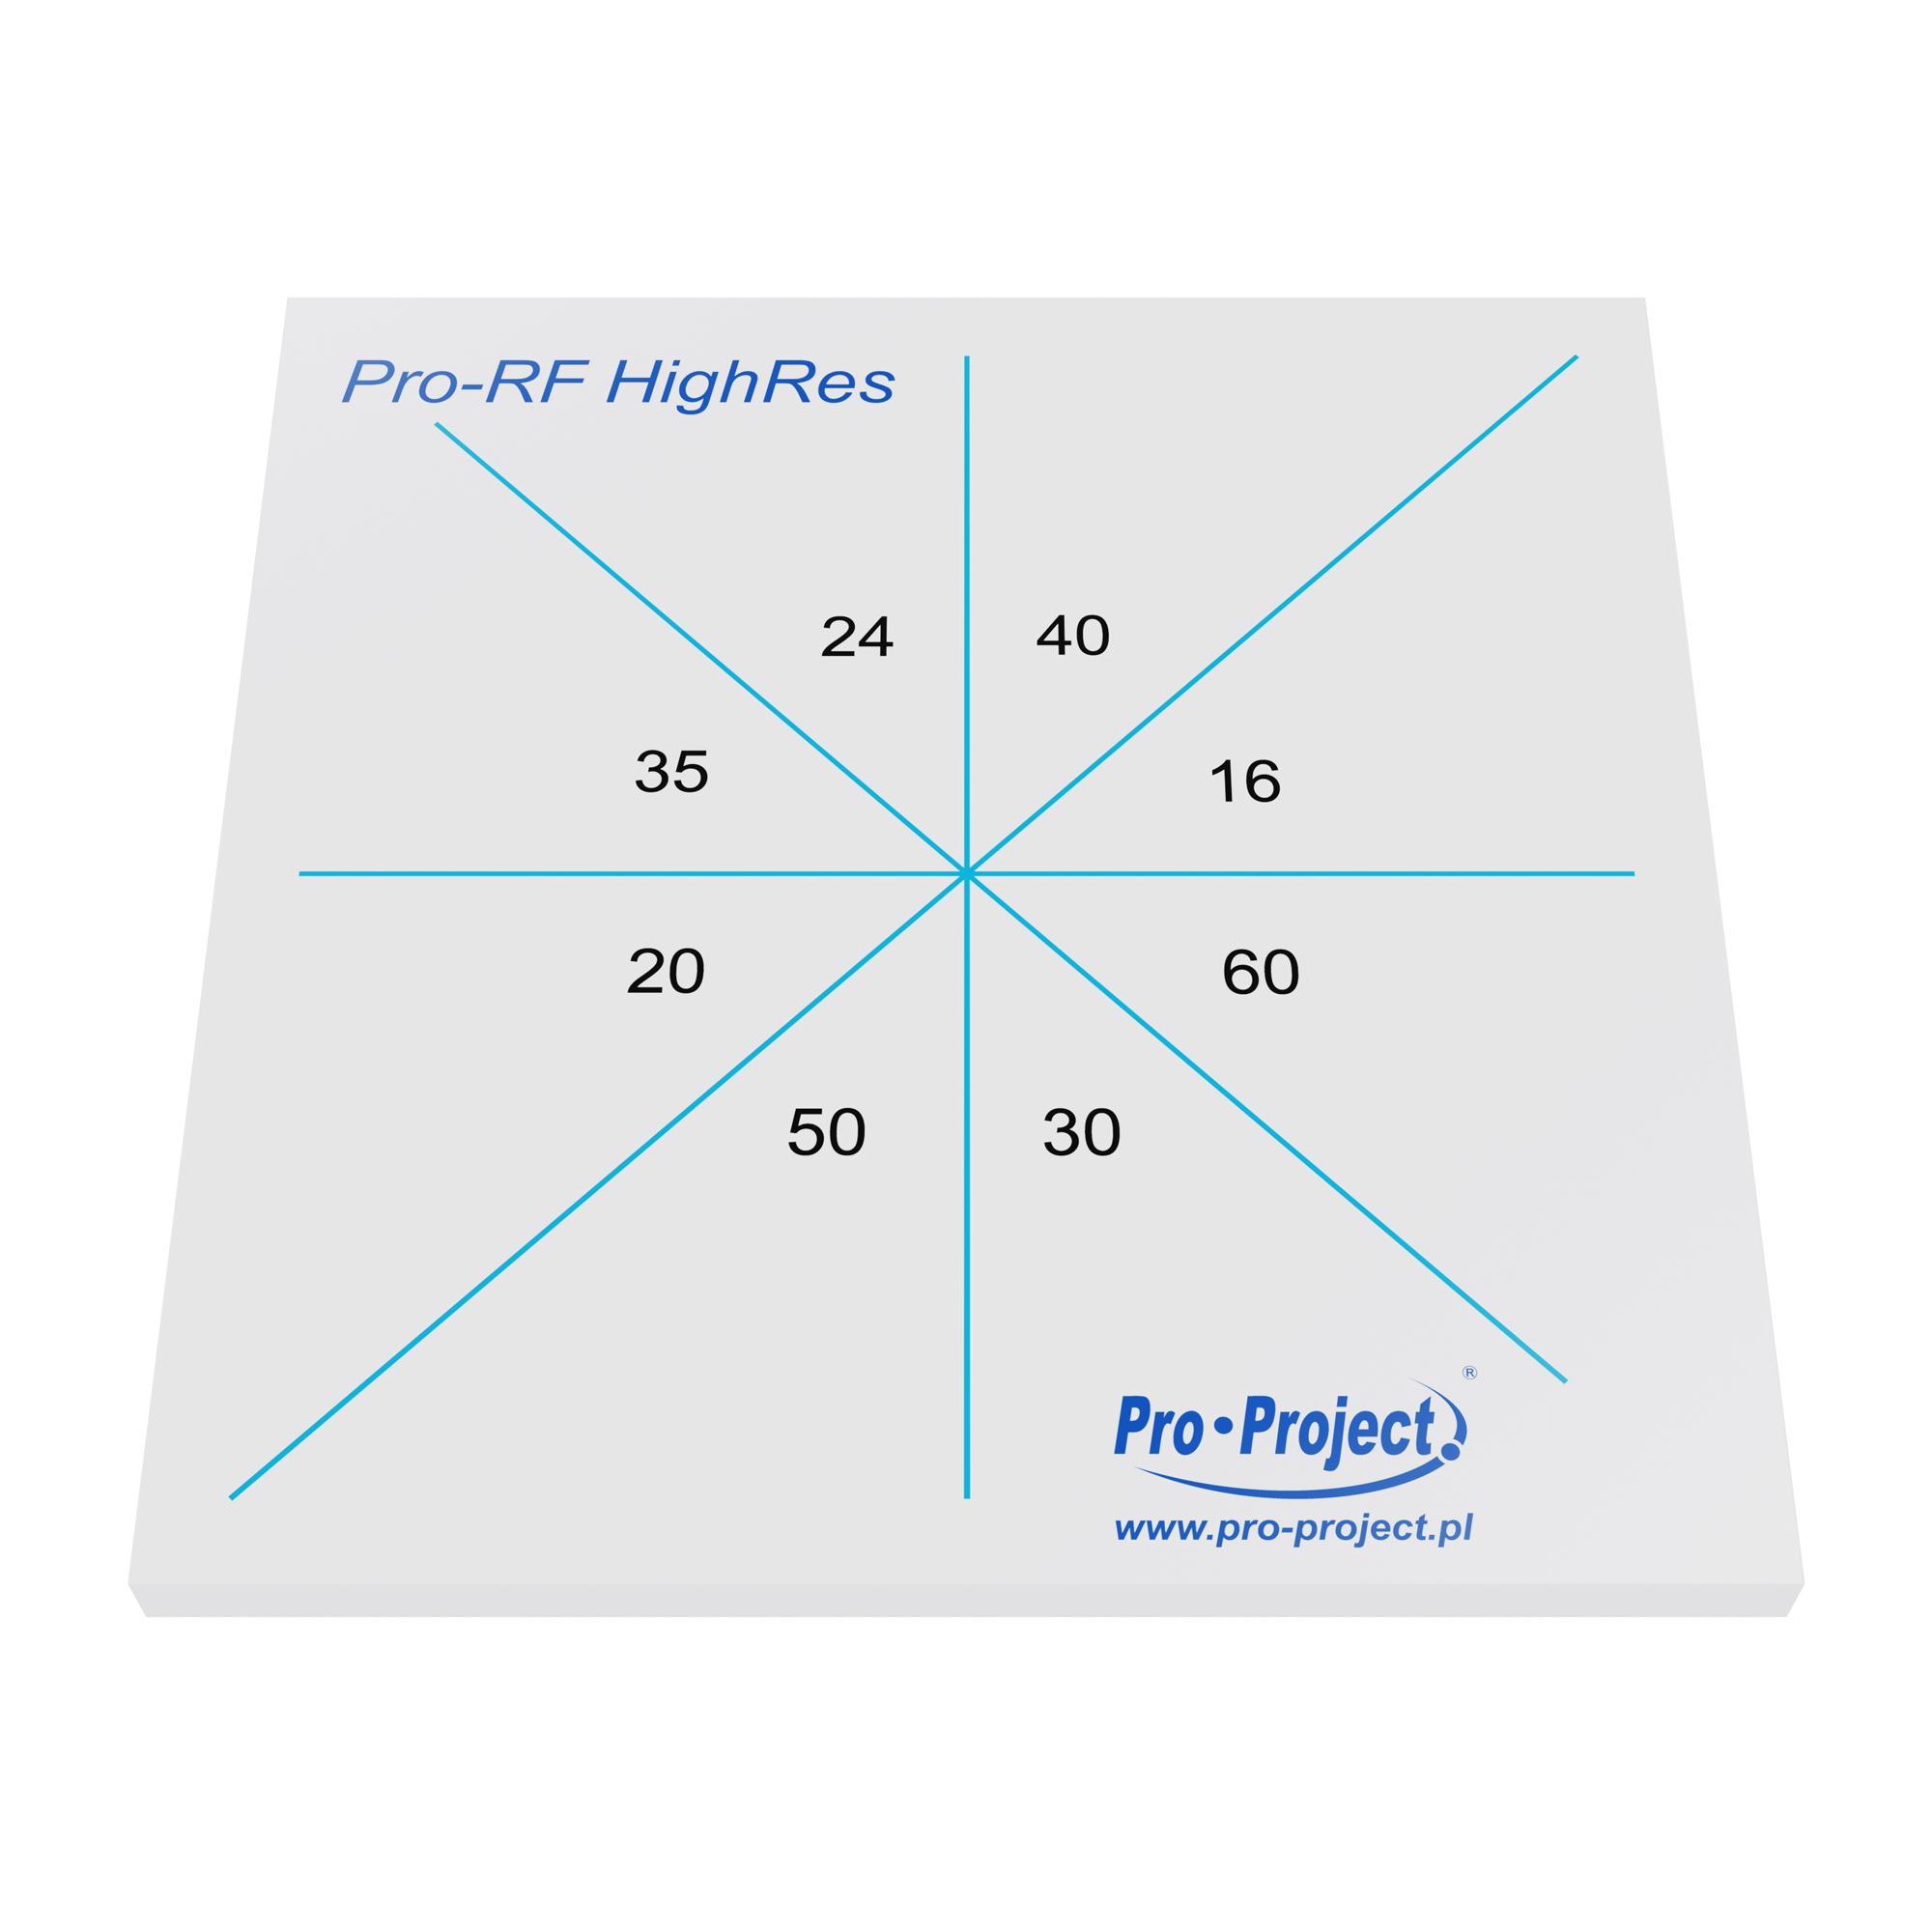 Pro-RF HighRes